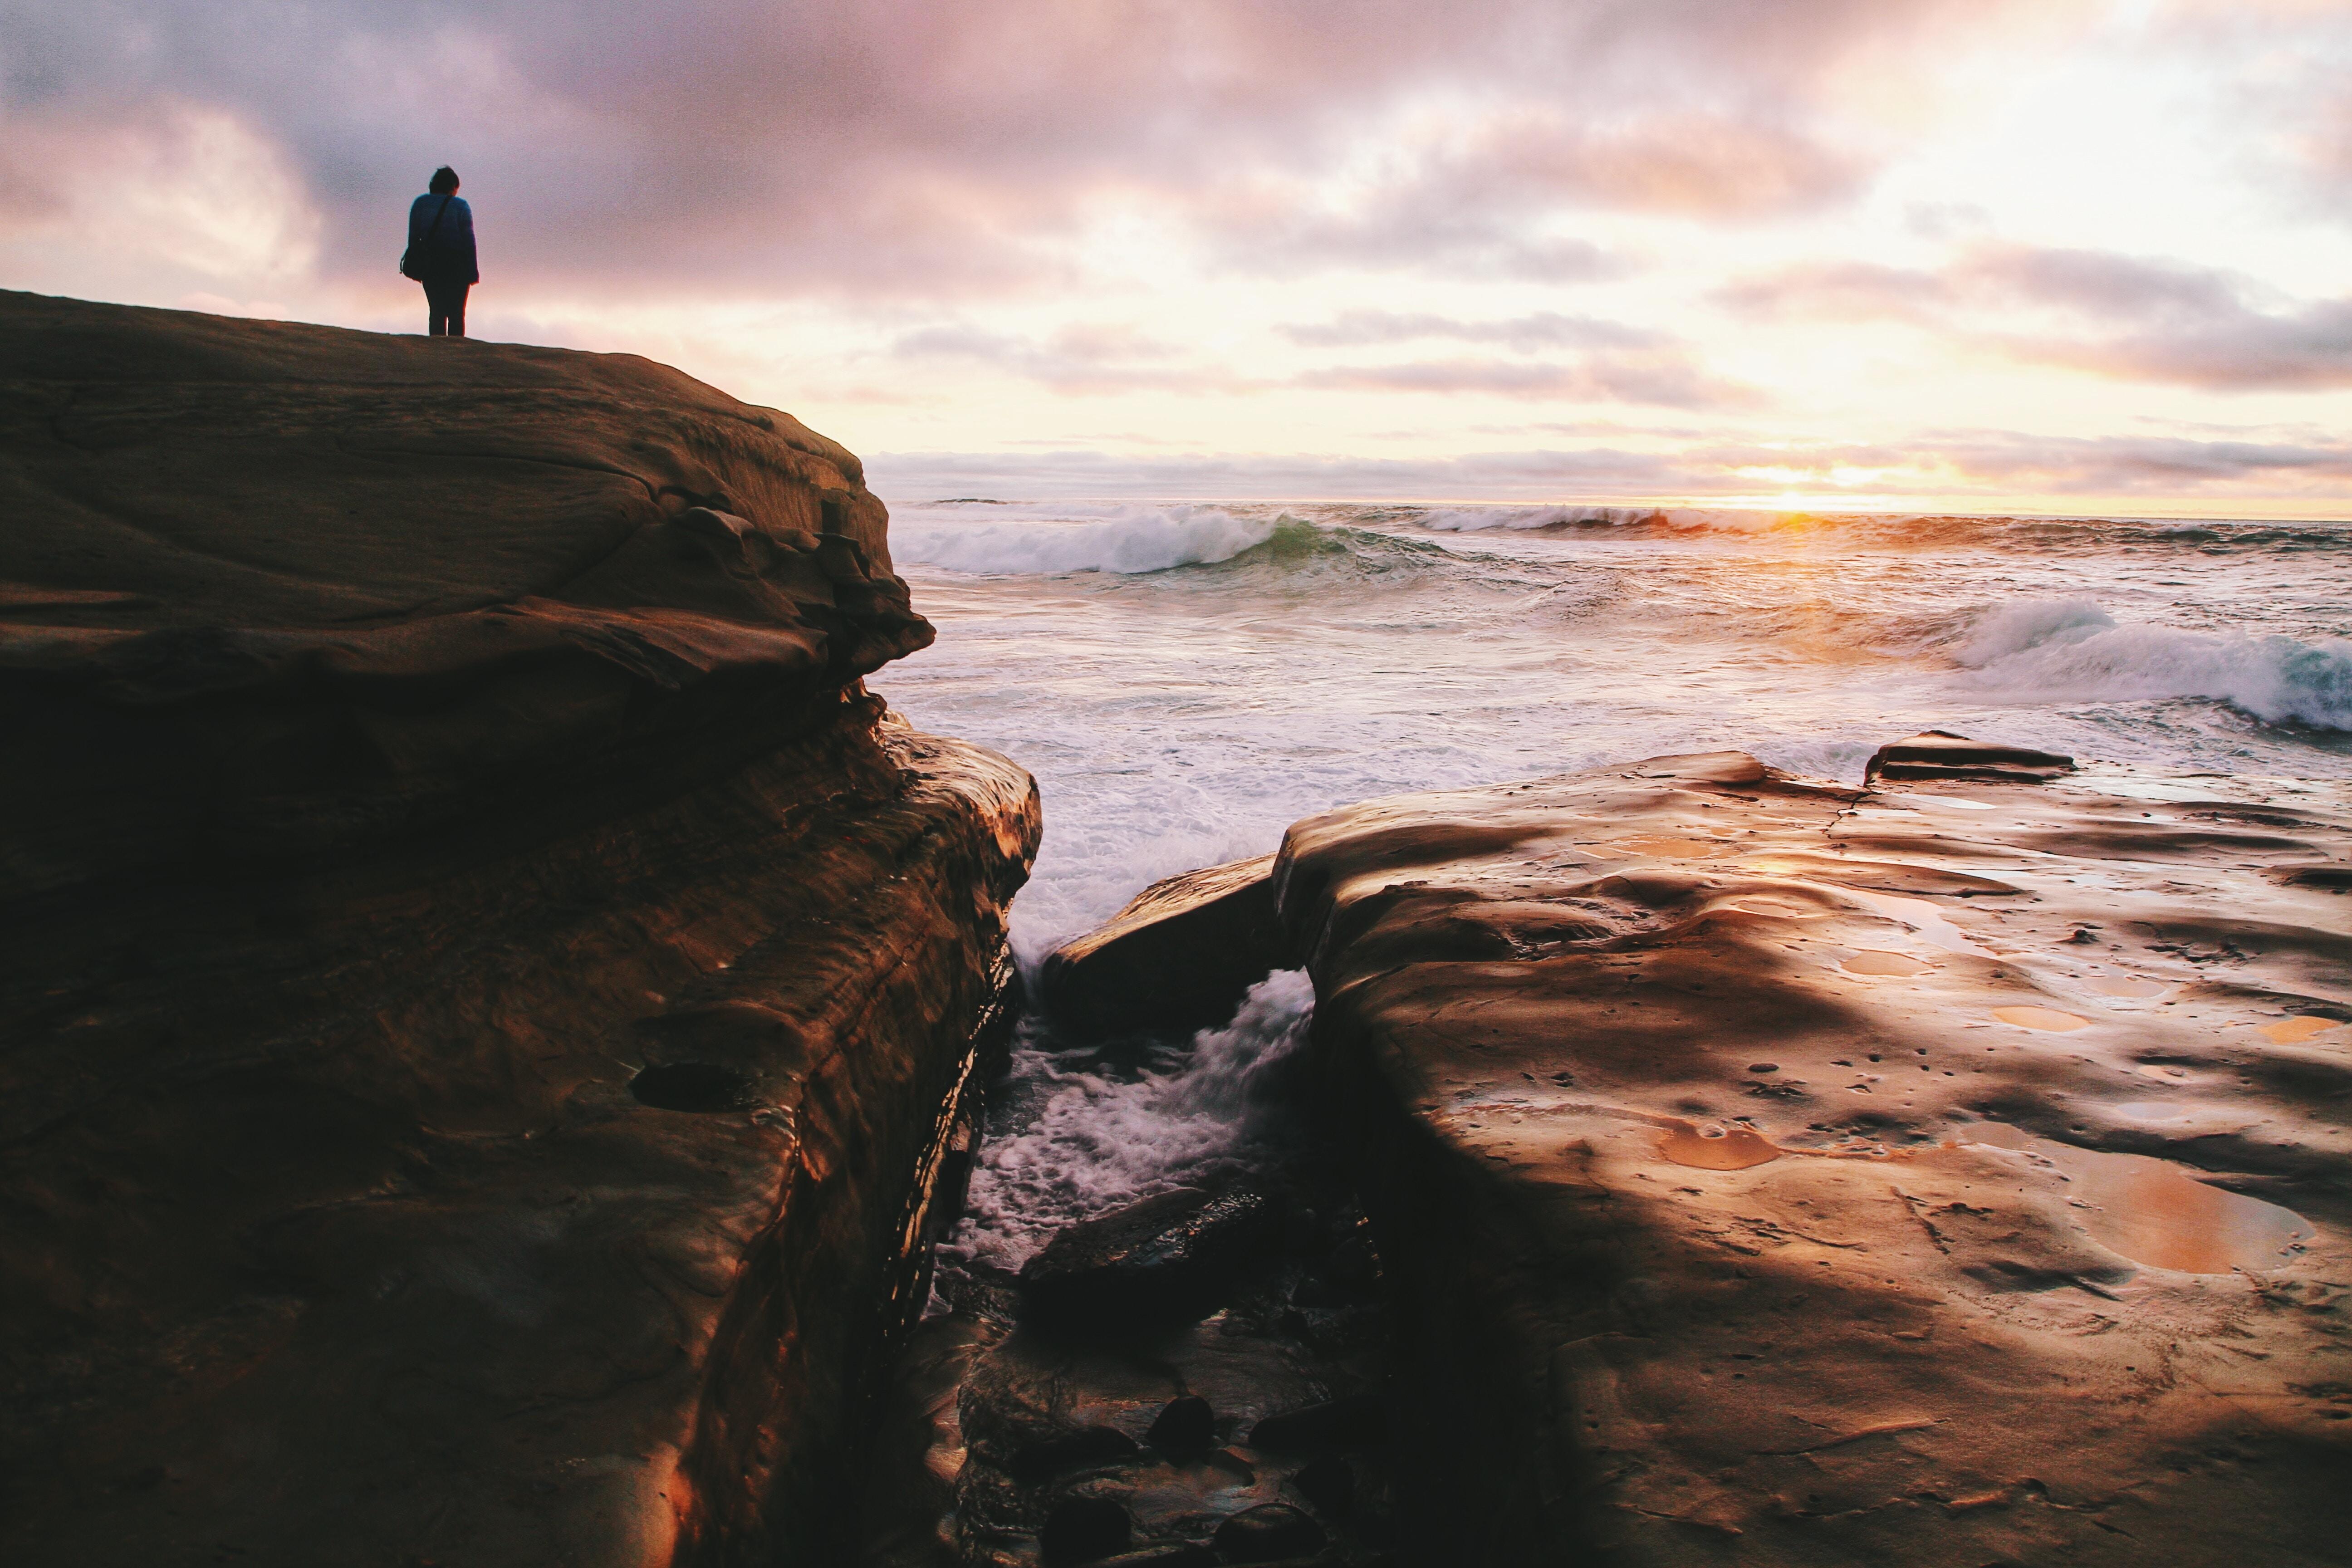 Silhouette person standing on coastline rock with white water ocean braking below